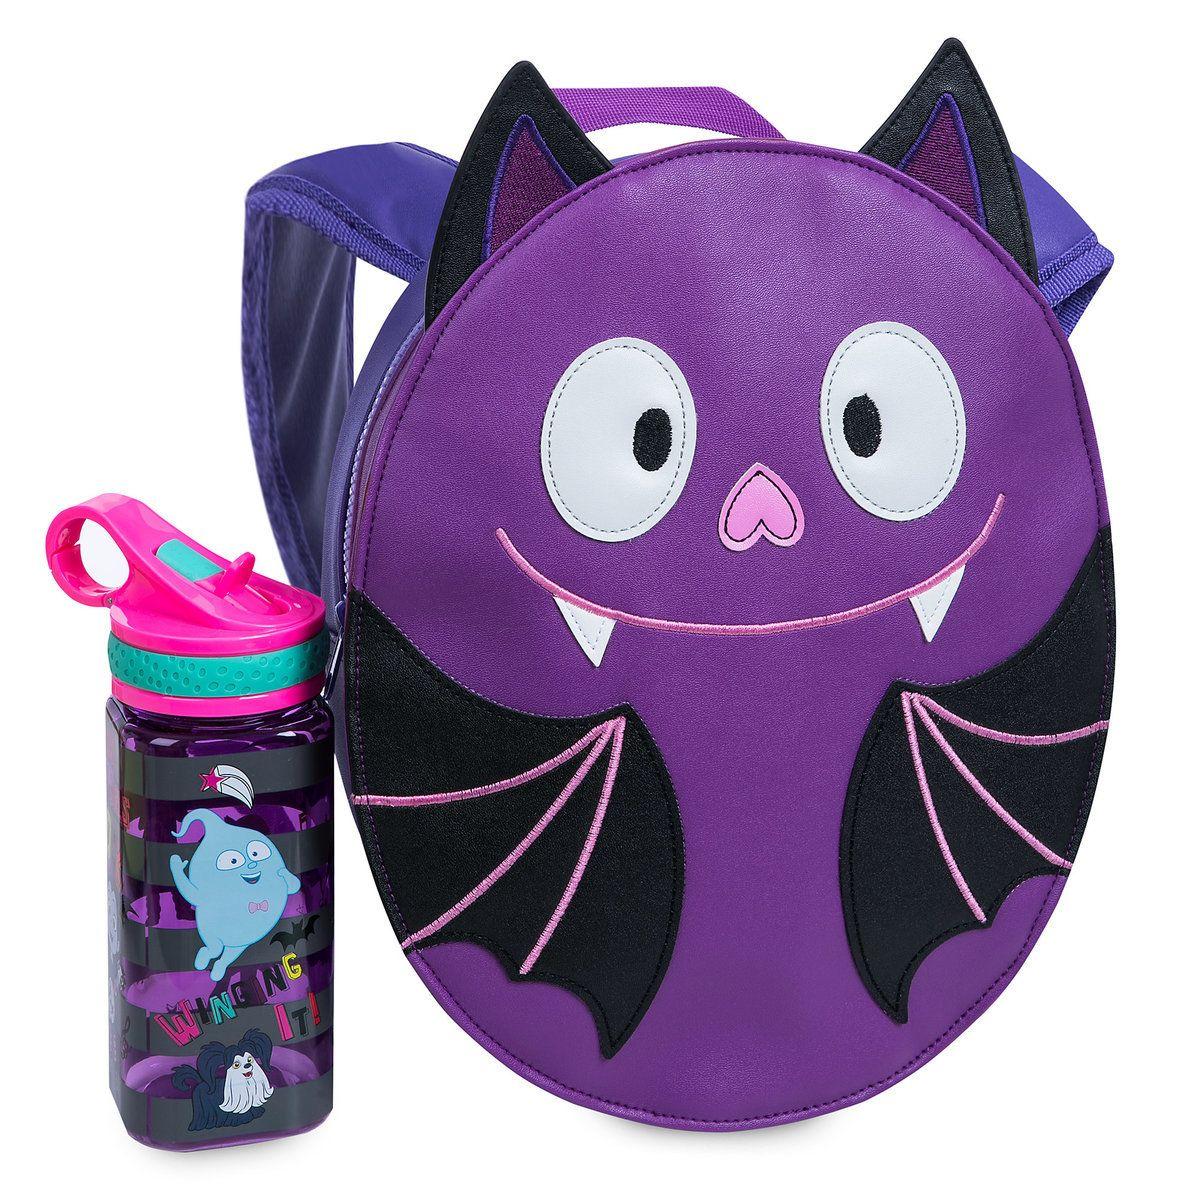 07bf31e1104 Product Image of Vampirina Junior Backpack - Personalizable   2